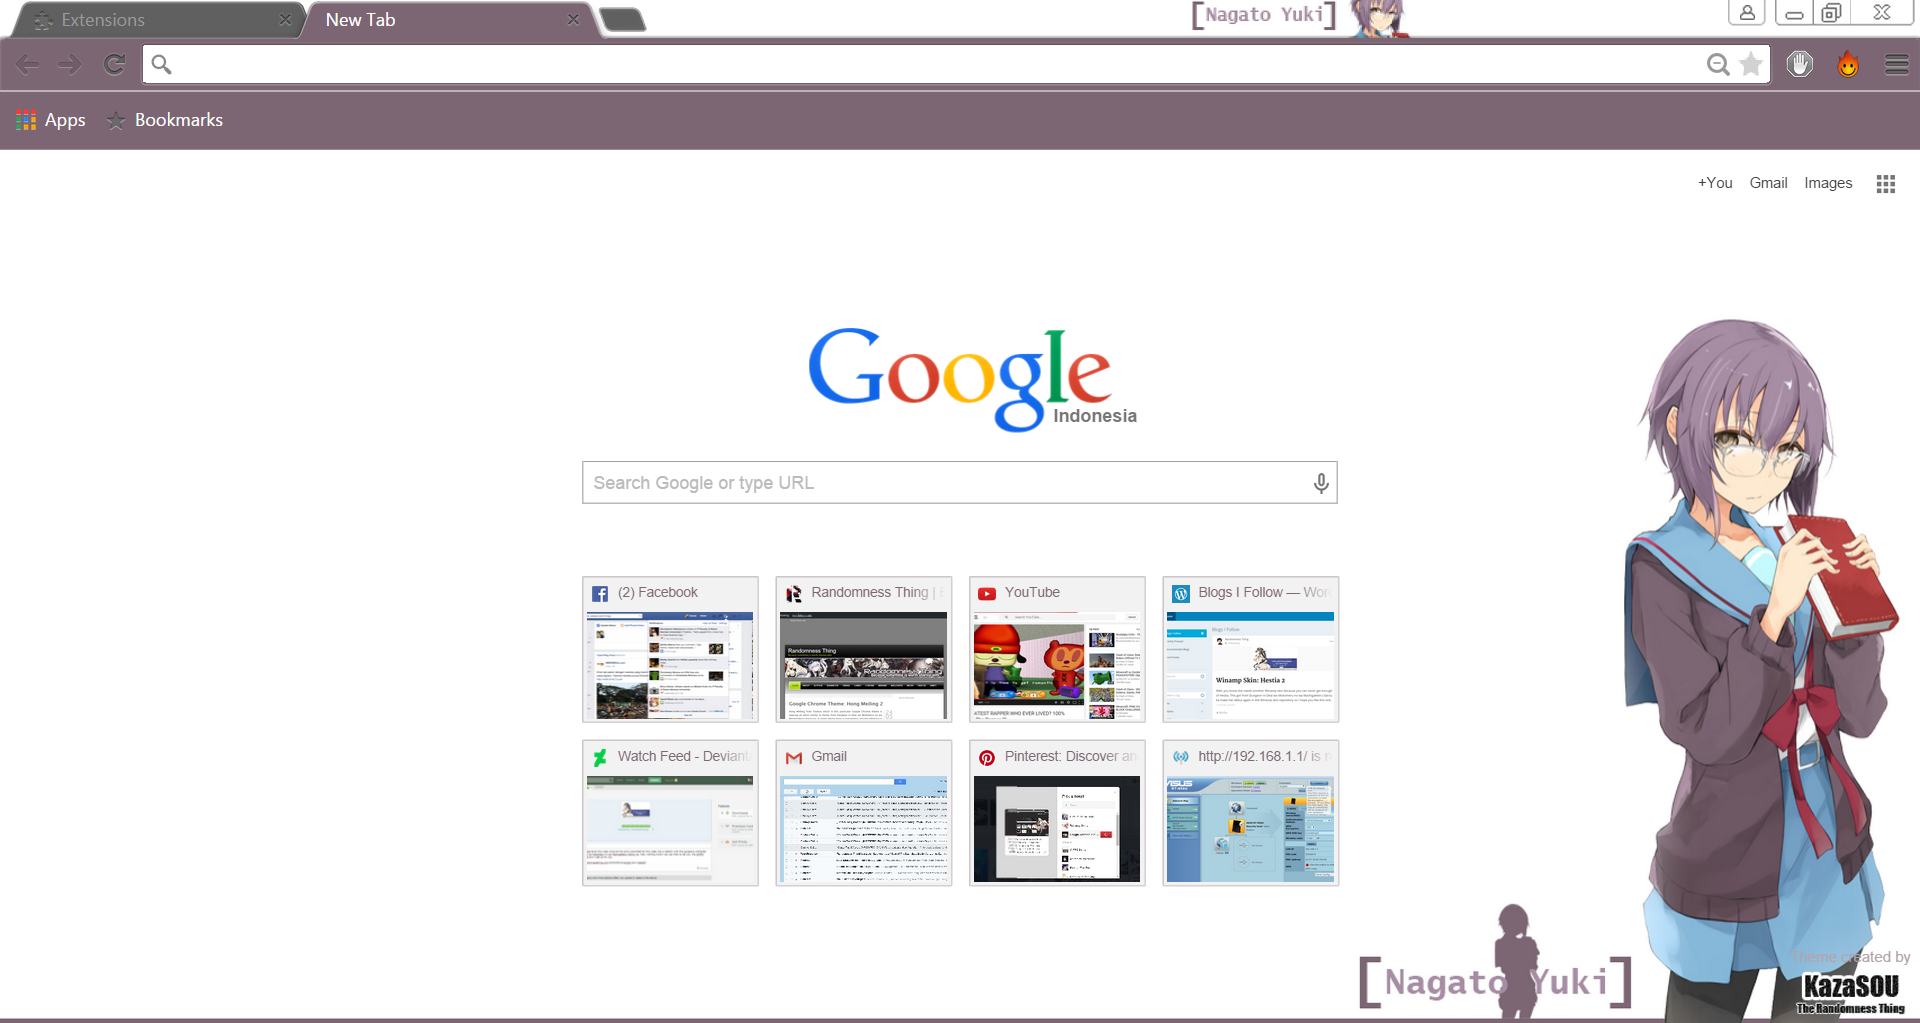 Gmail themes chrome - Nagato_yuki_chrome